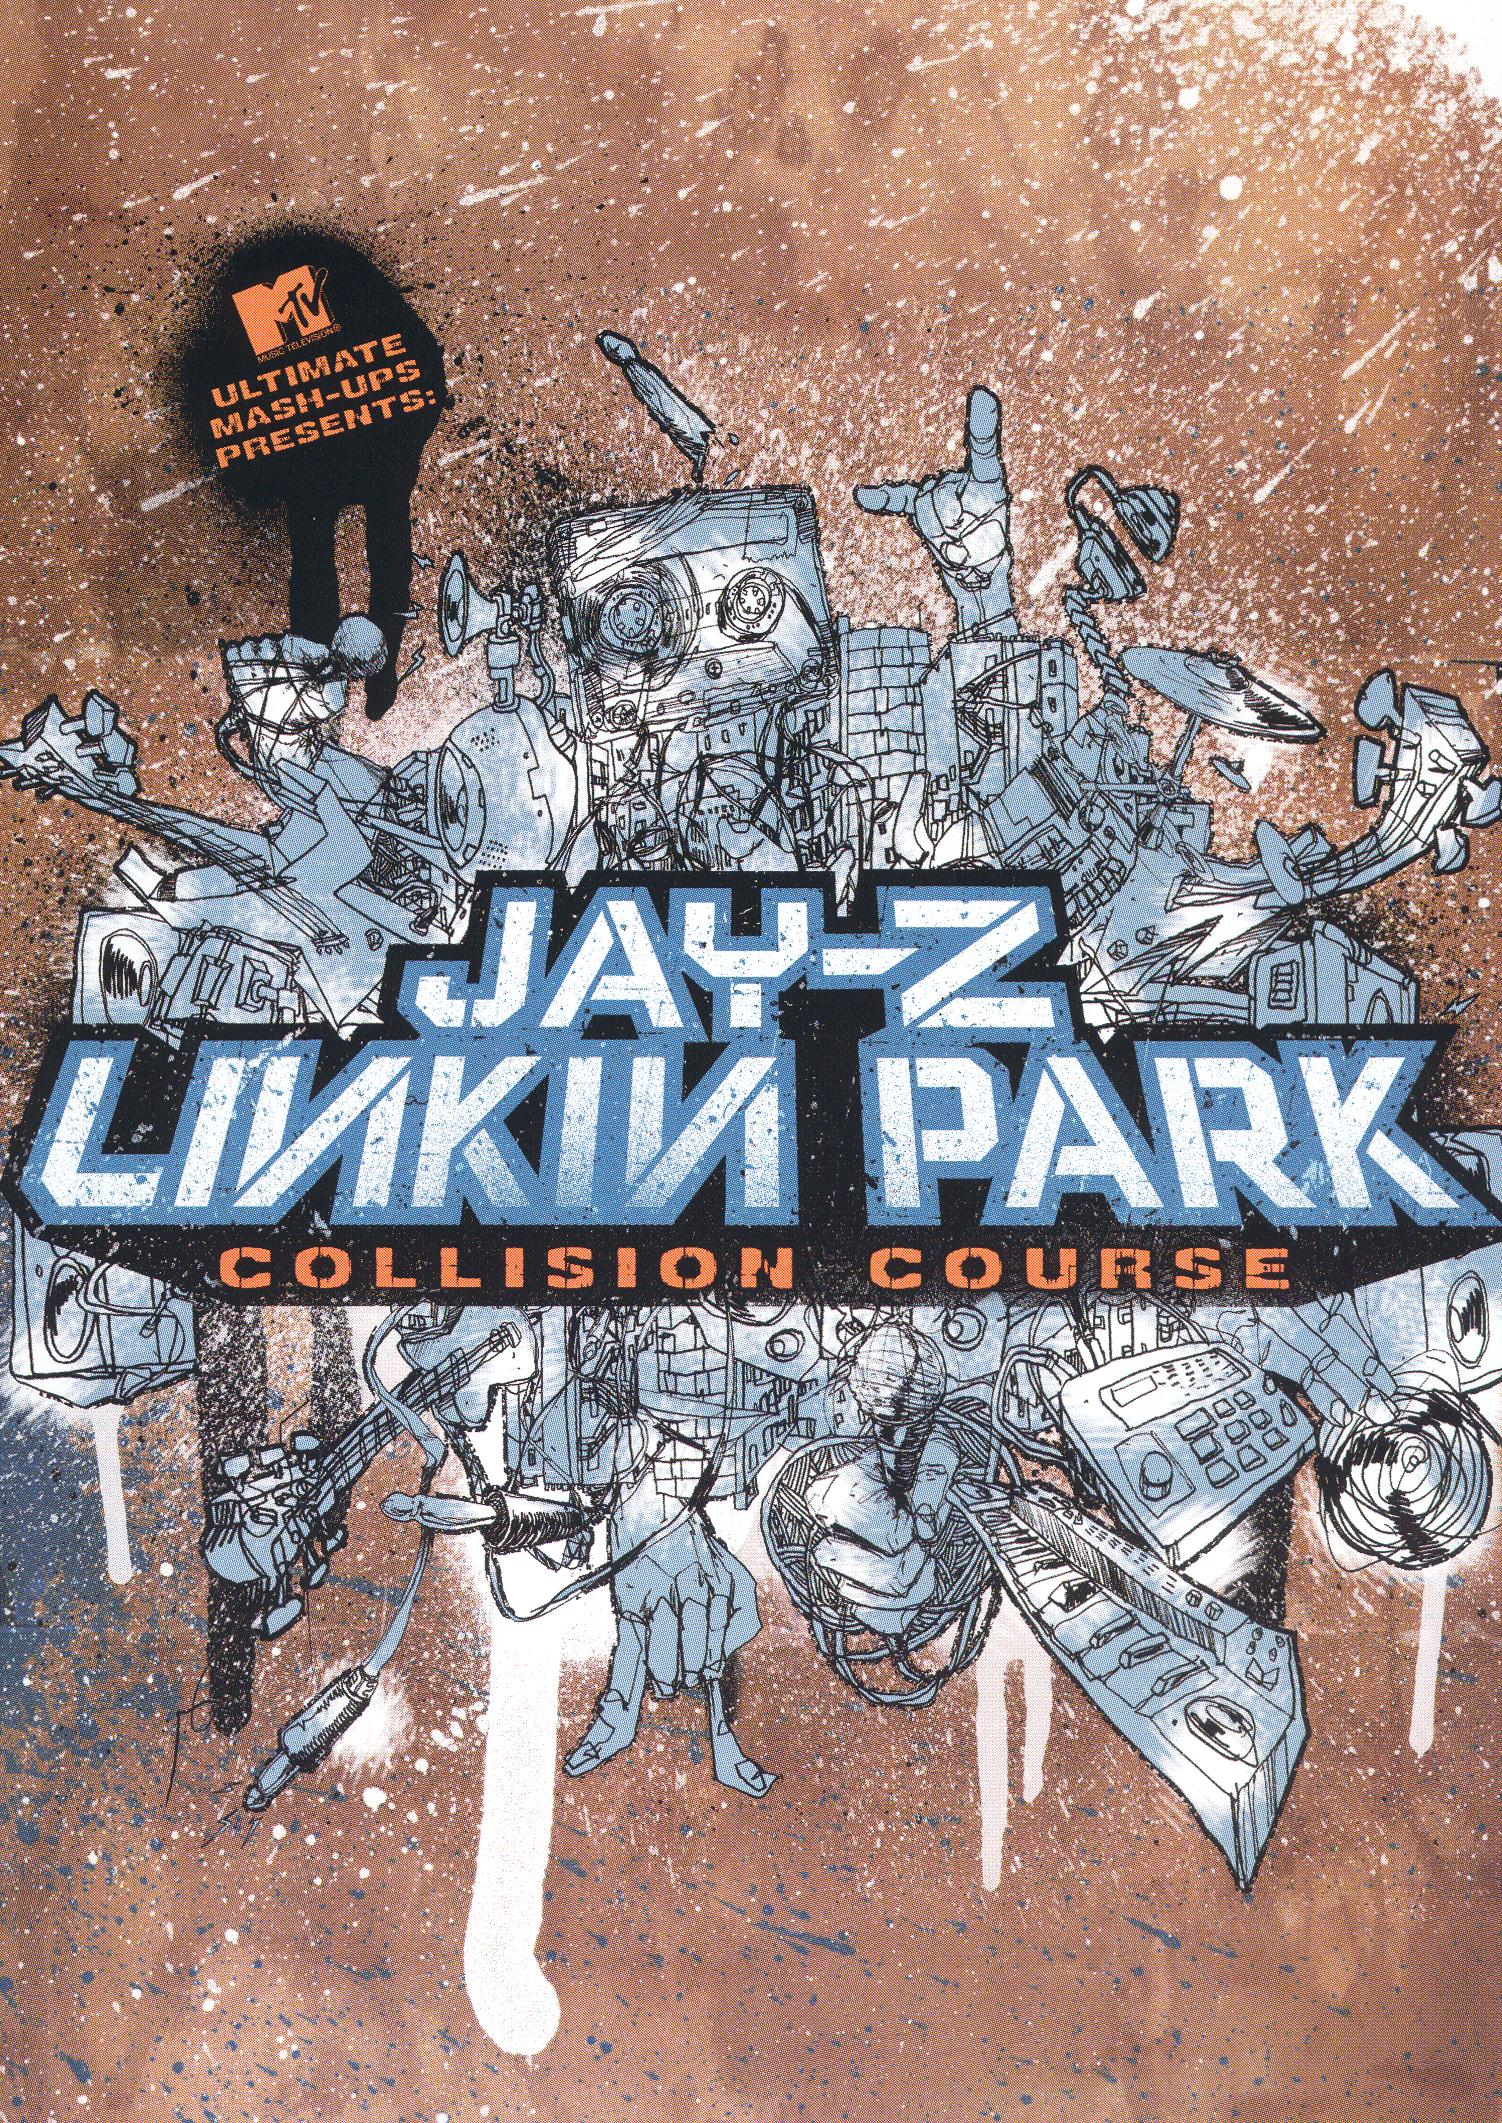 Jay-Z/Linkin Park: Collision Course